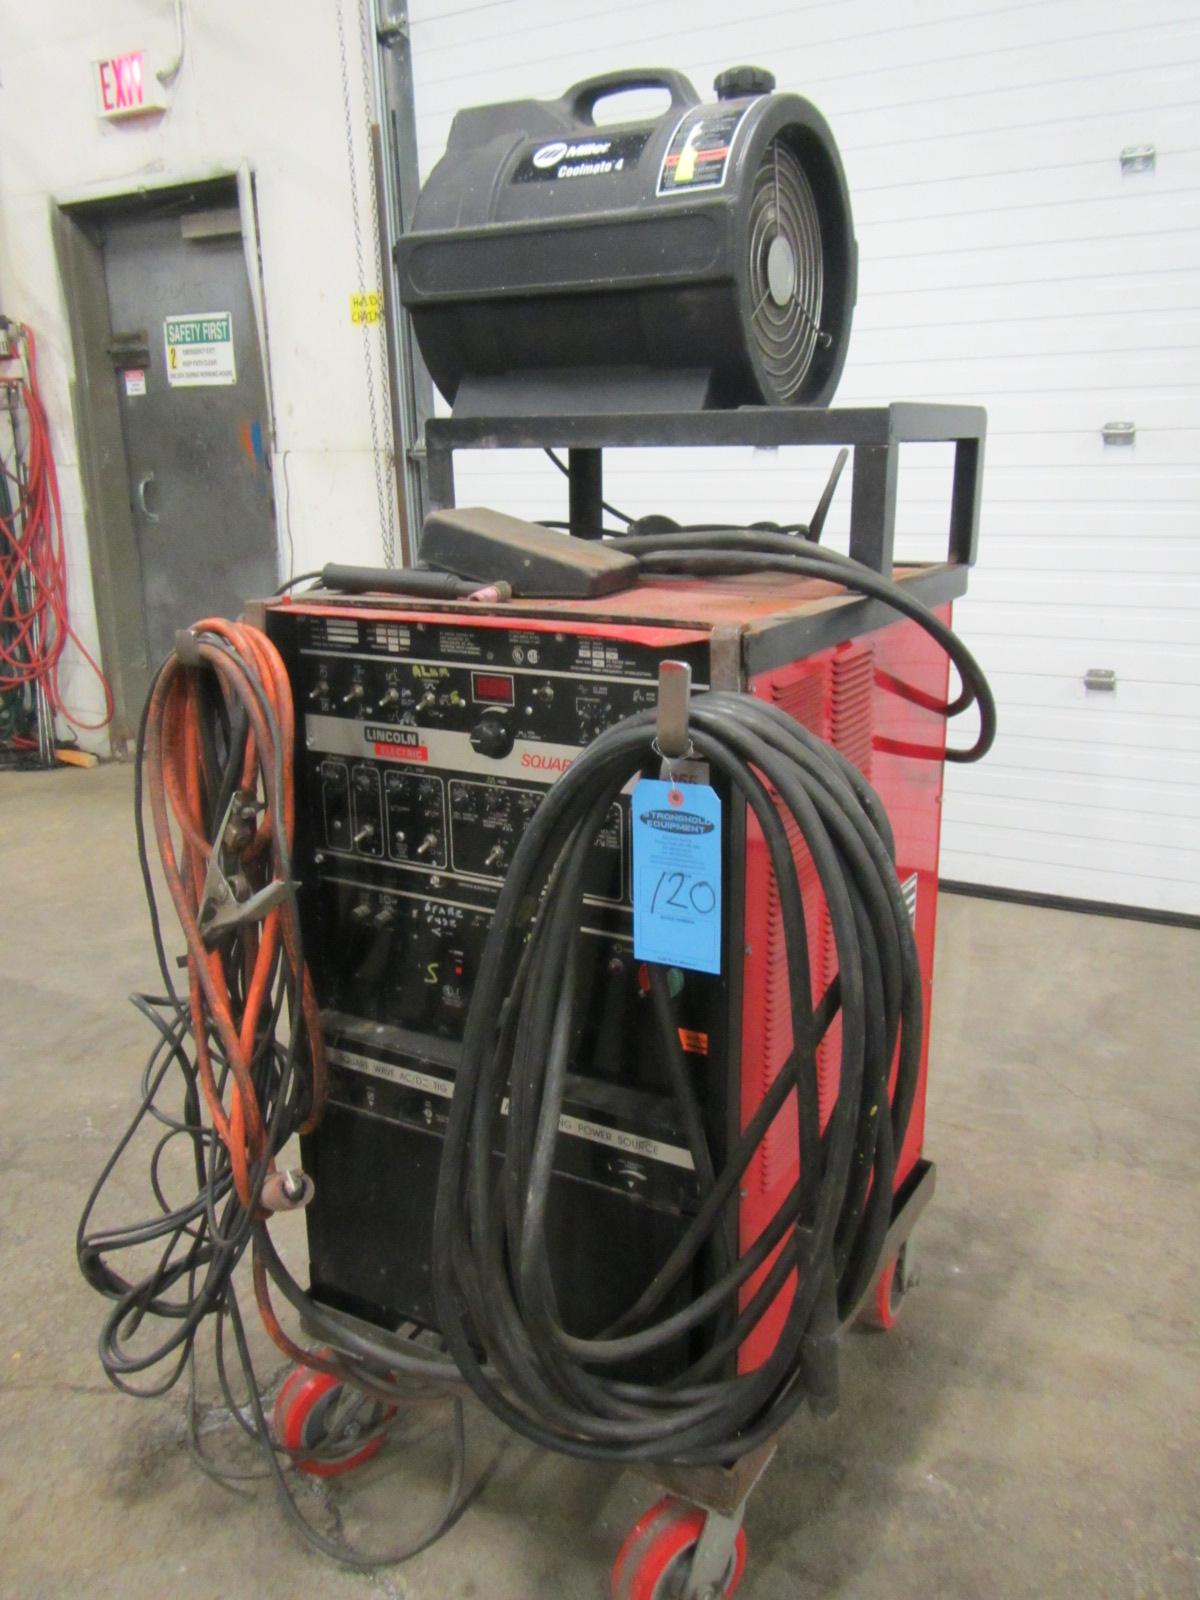 lincoln forum tig board or call garage the showthread welder journal text welders